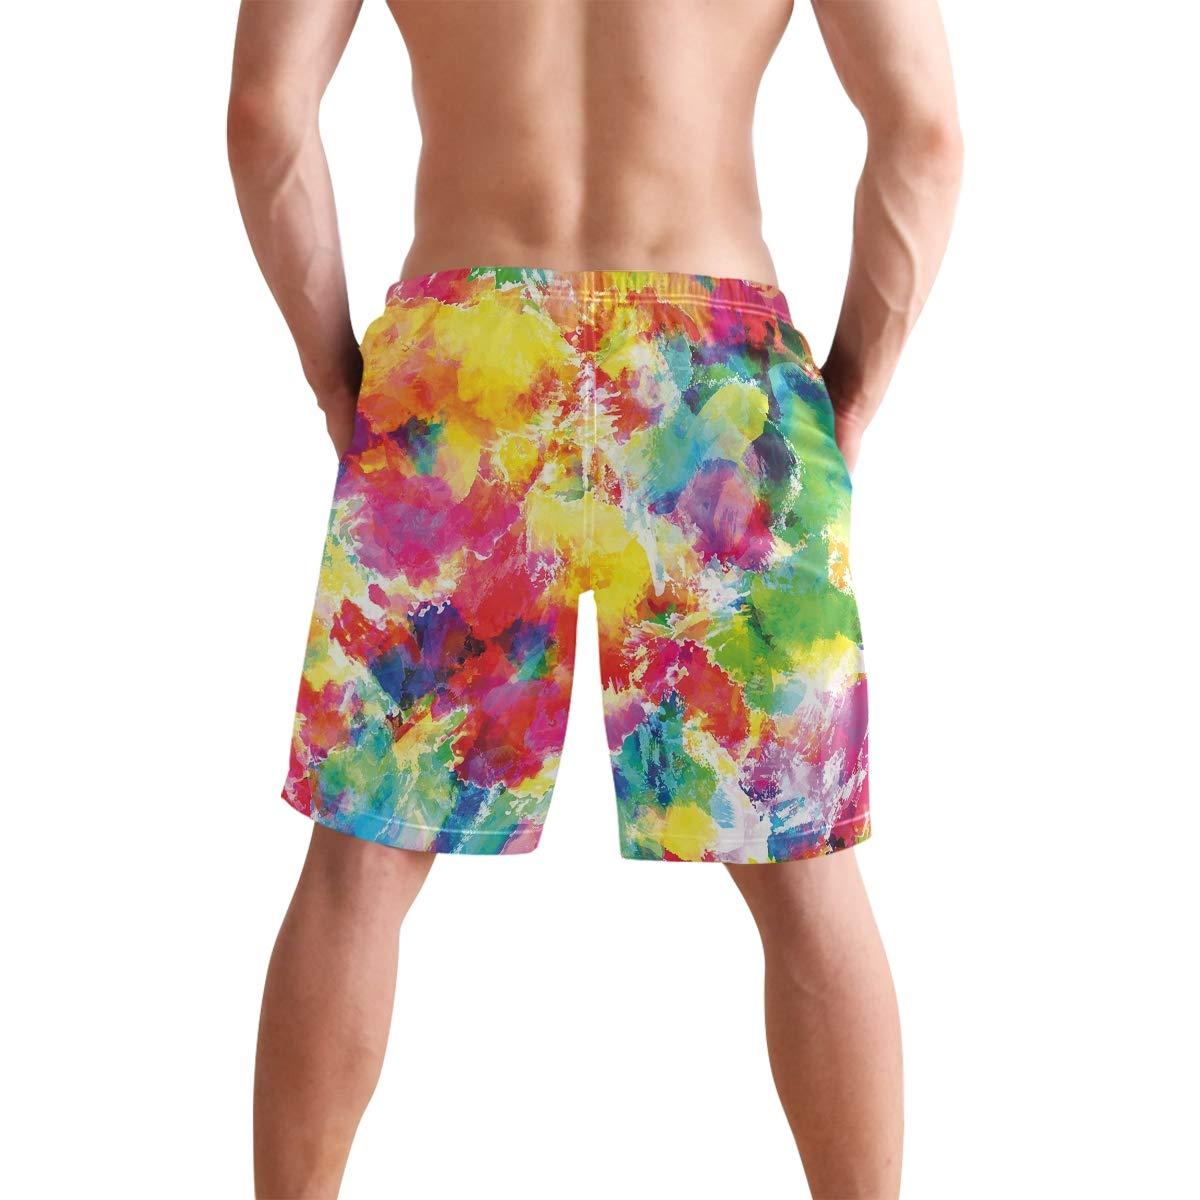 COVASA Mens Summer ShortsOil Painting Style Abstract Watercolors Brushstrokes